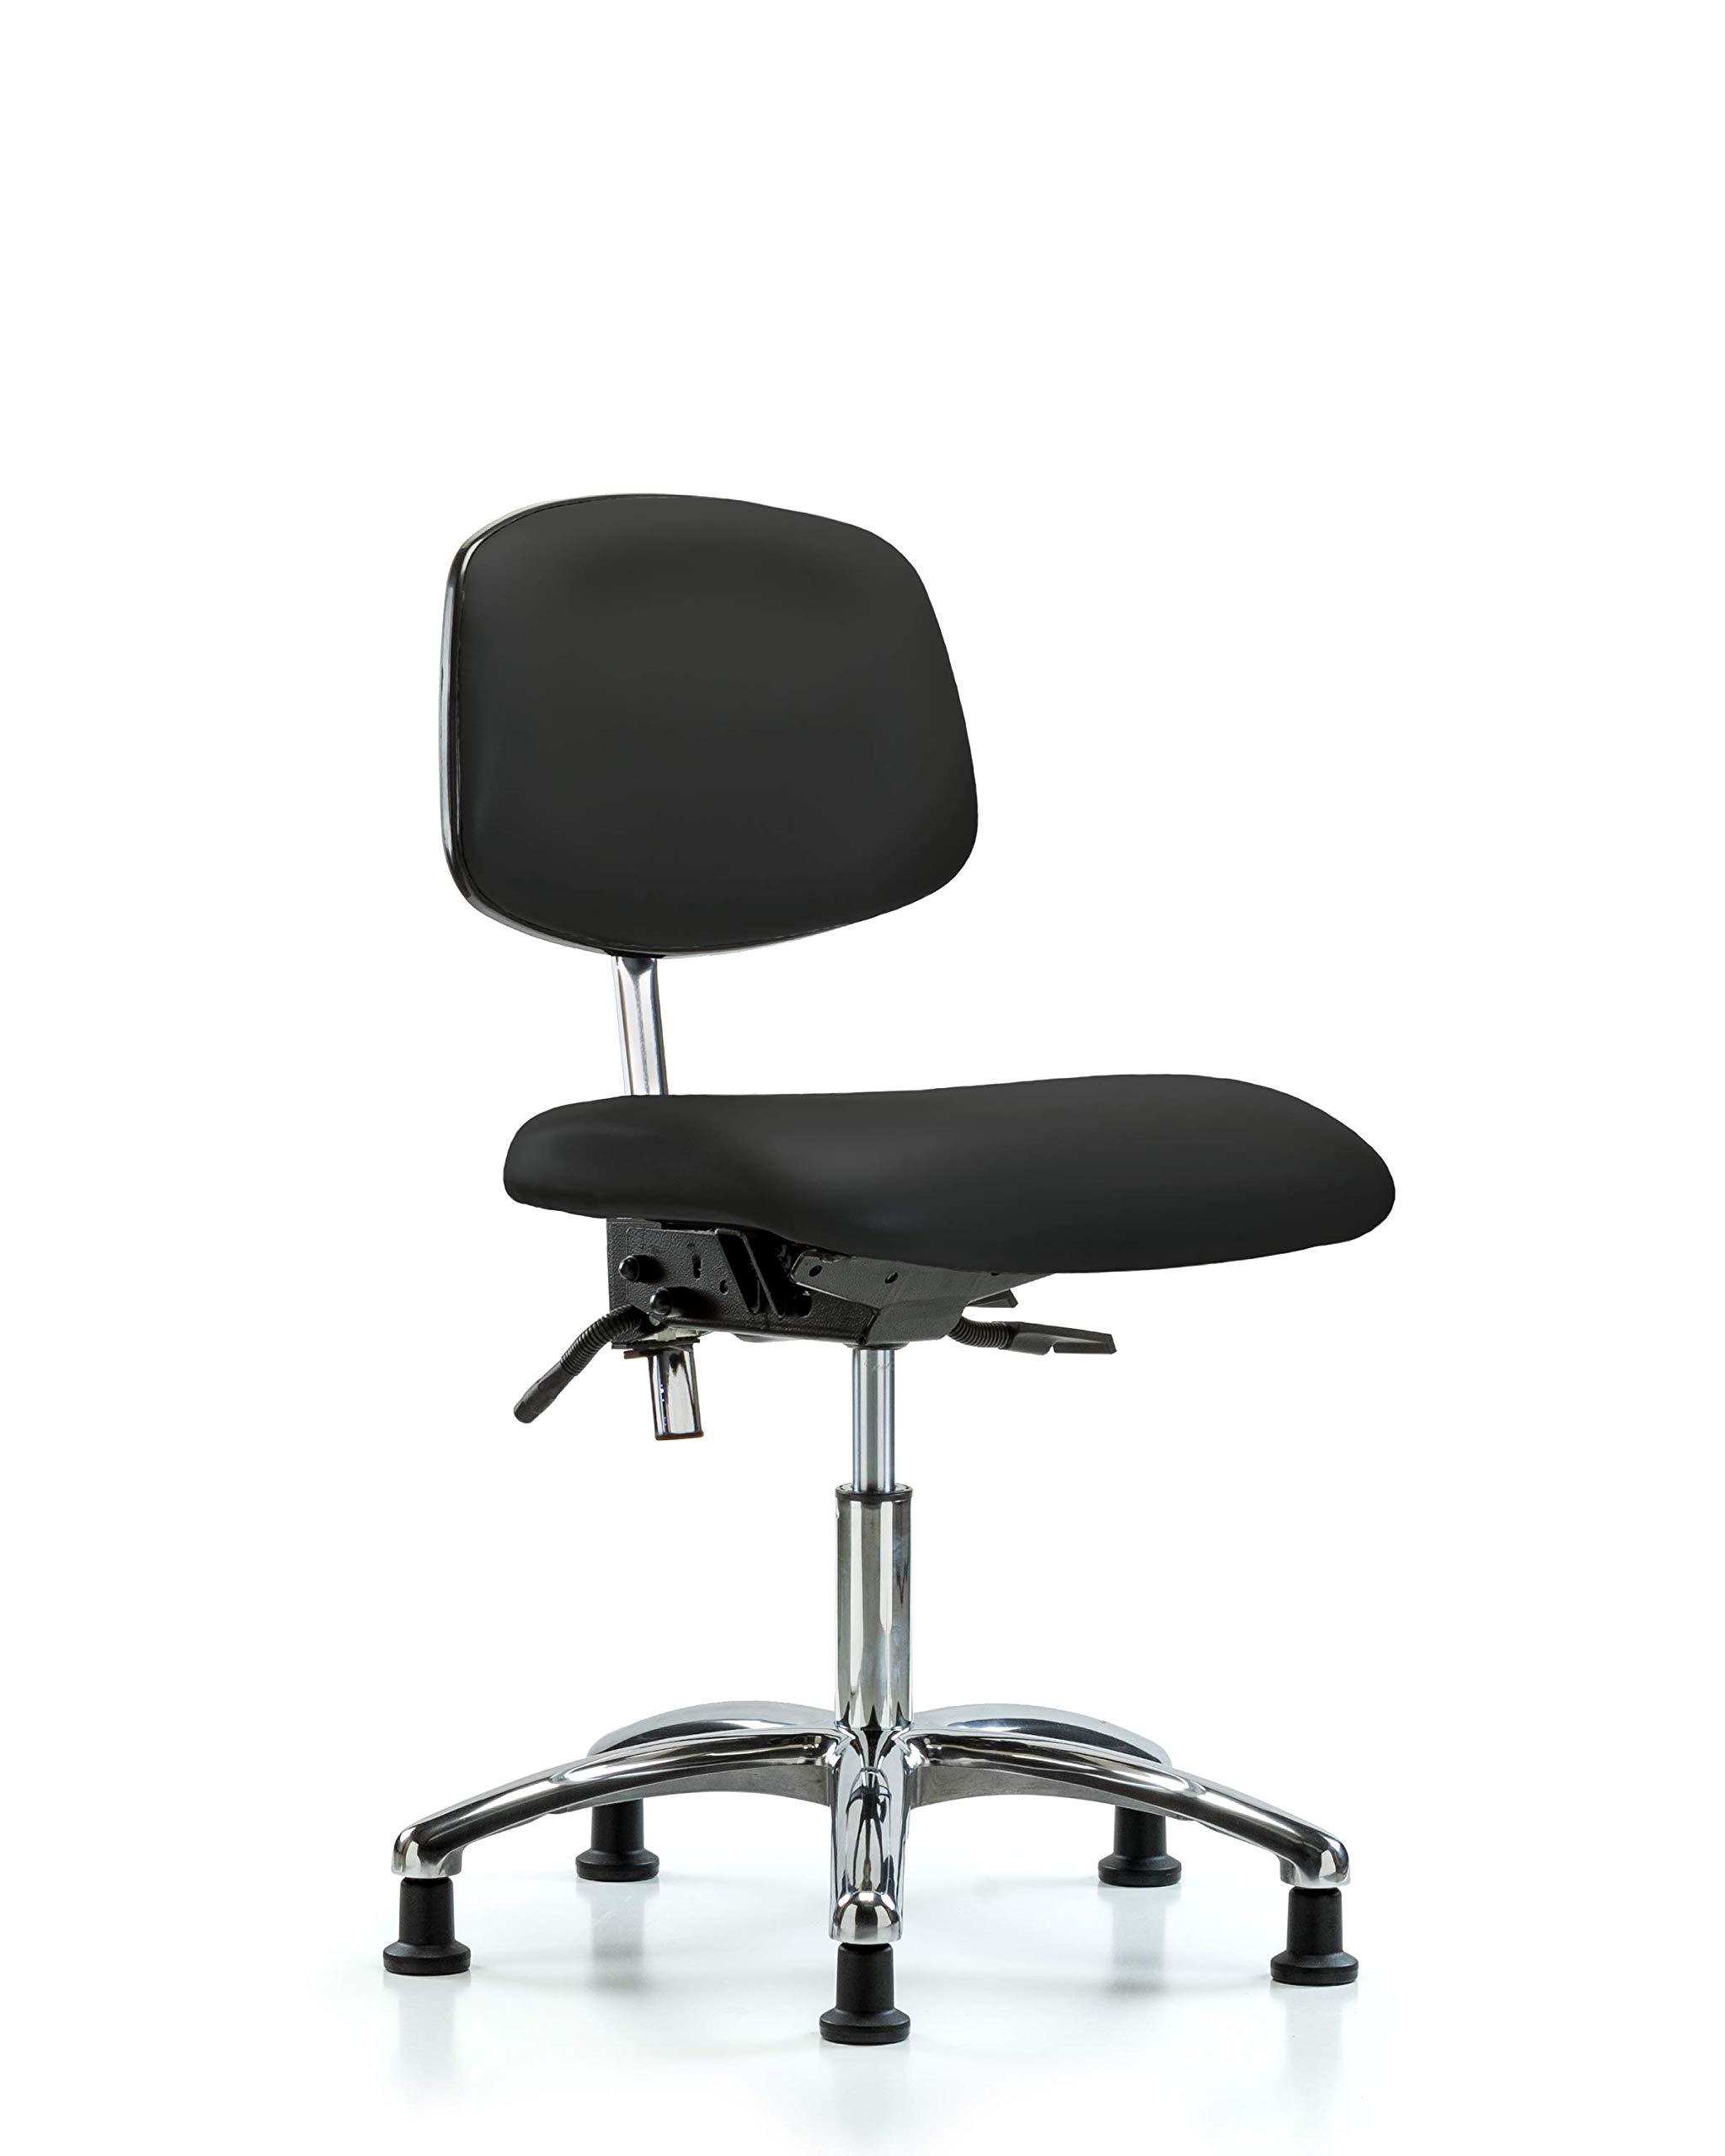 LabTech Seating LT42967 Class 100 Clean Room Vinyl Desk Height Chair Chrome Base, Tilt, Glides, Black